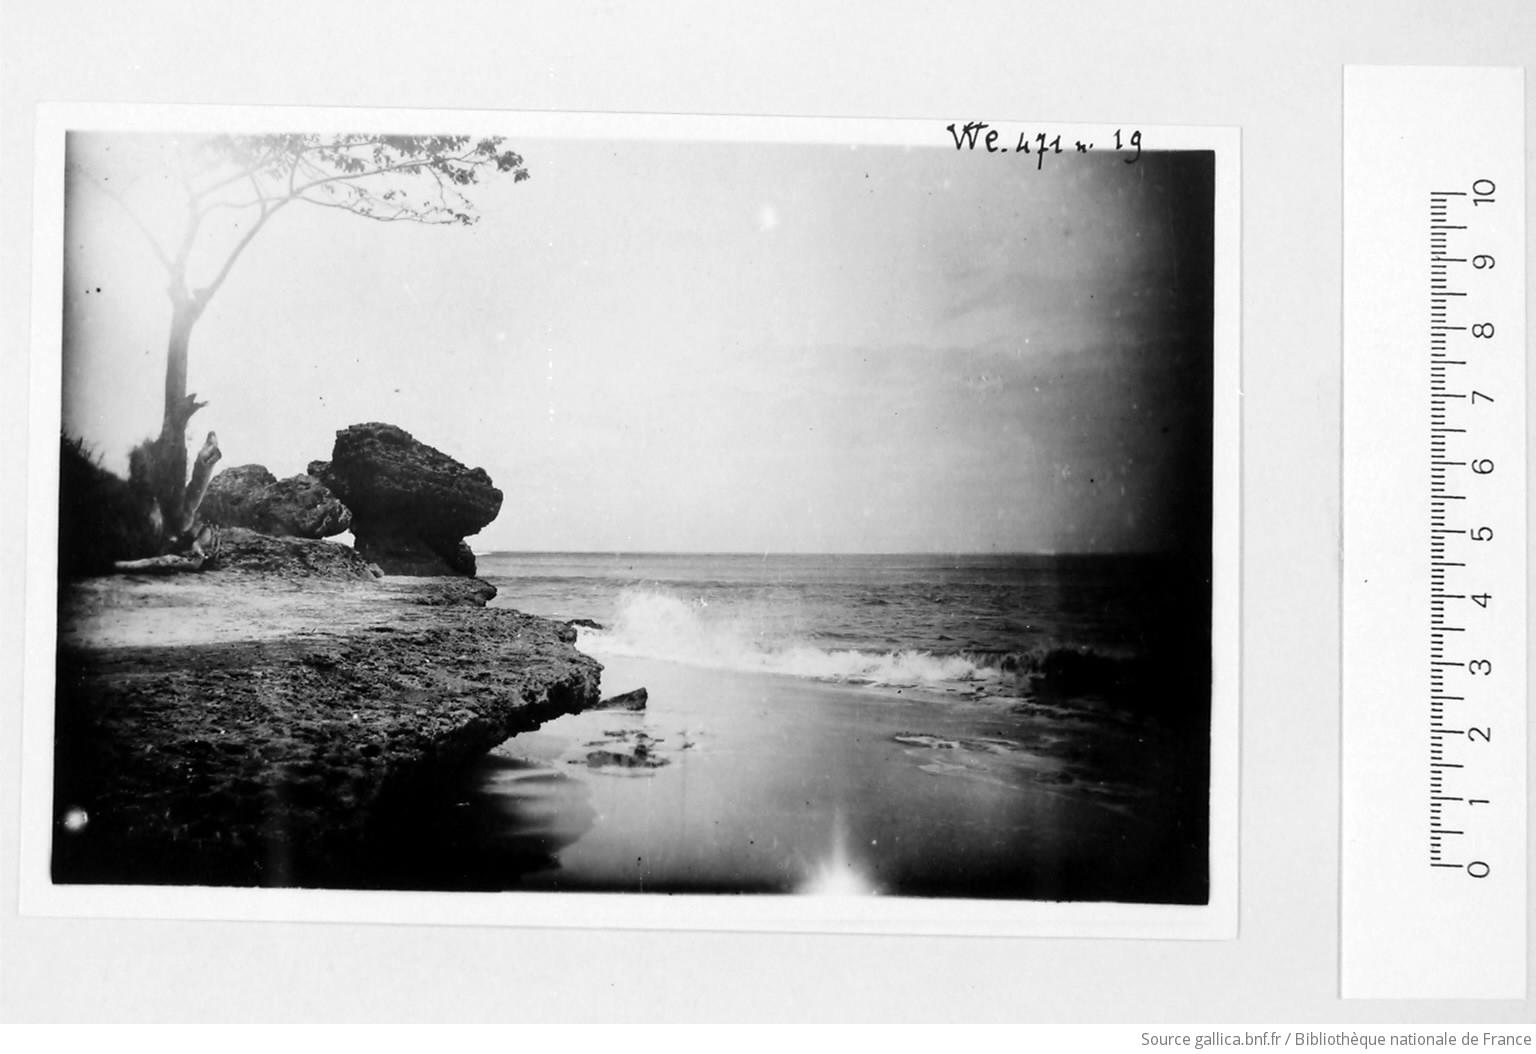 [39 phot. d'A.E.F. en 1924. Enregistré en 1936] - 19